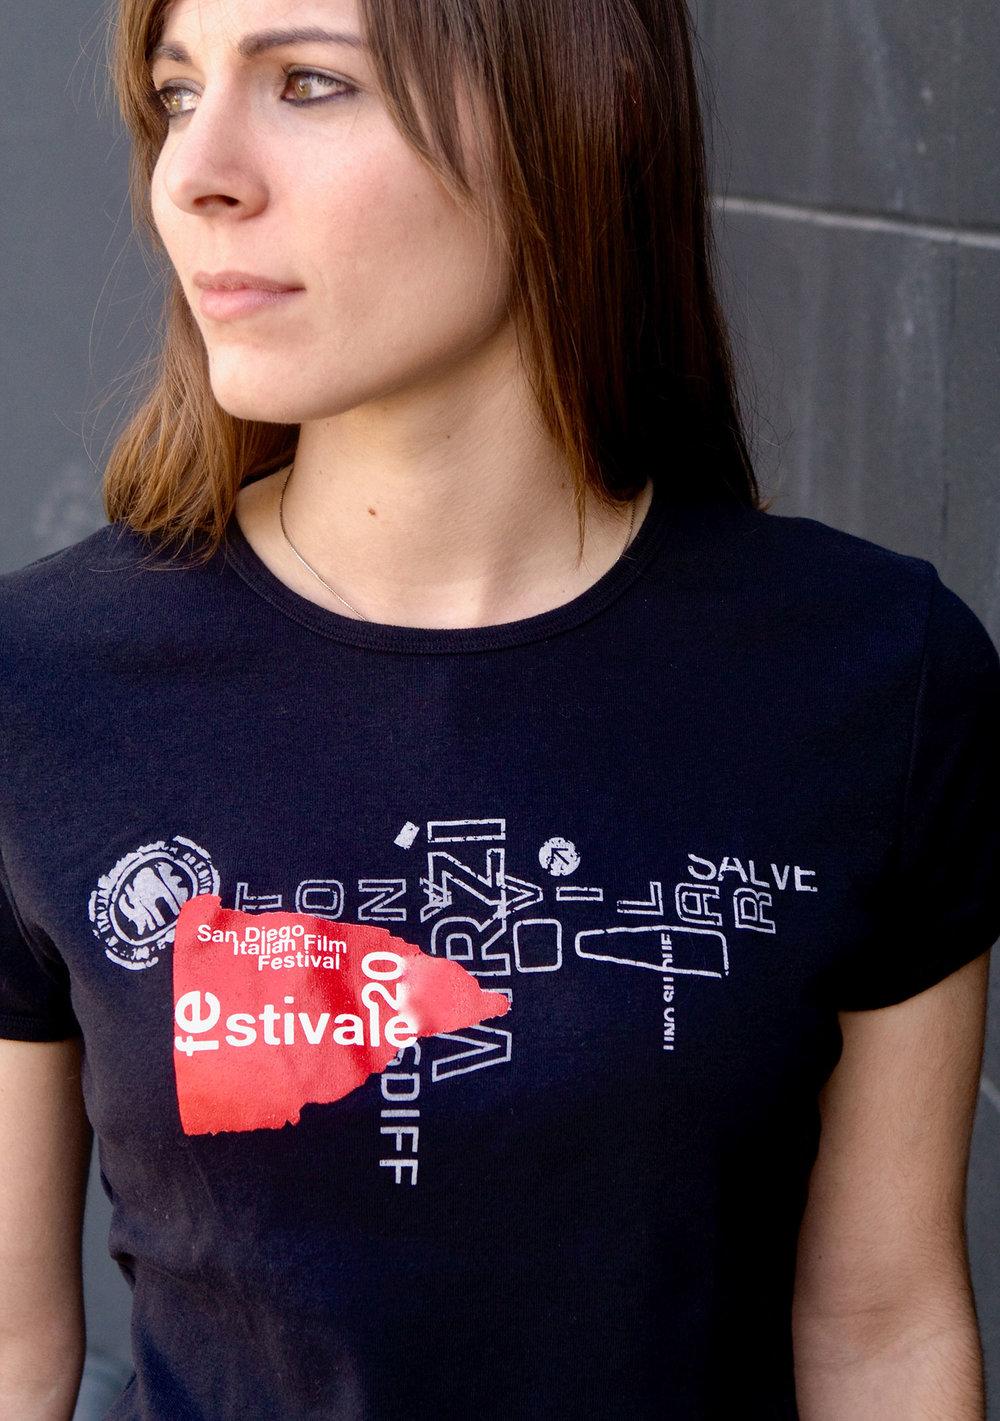 ron-miriello-grafico-san-diego-italian-film-festival-Miriello-branding-officina-05.jpg